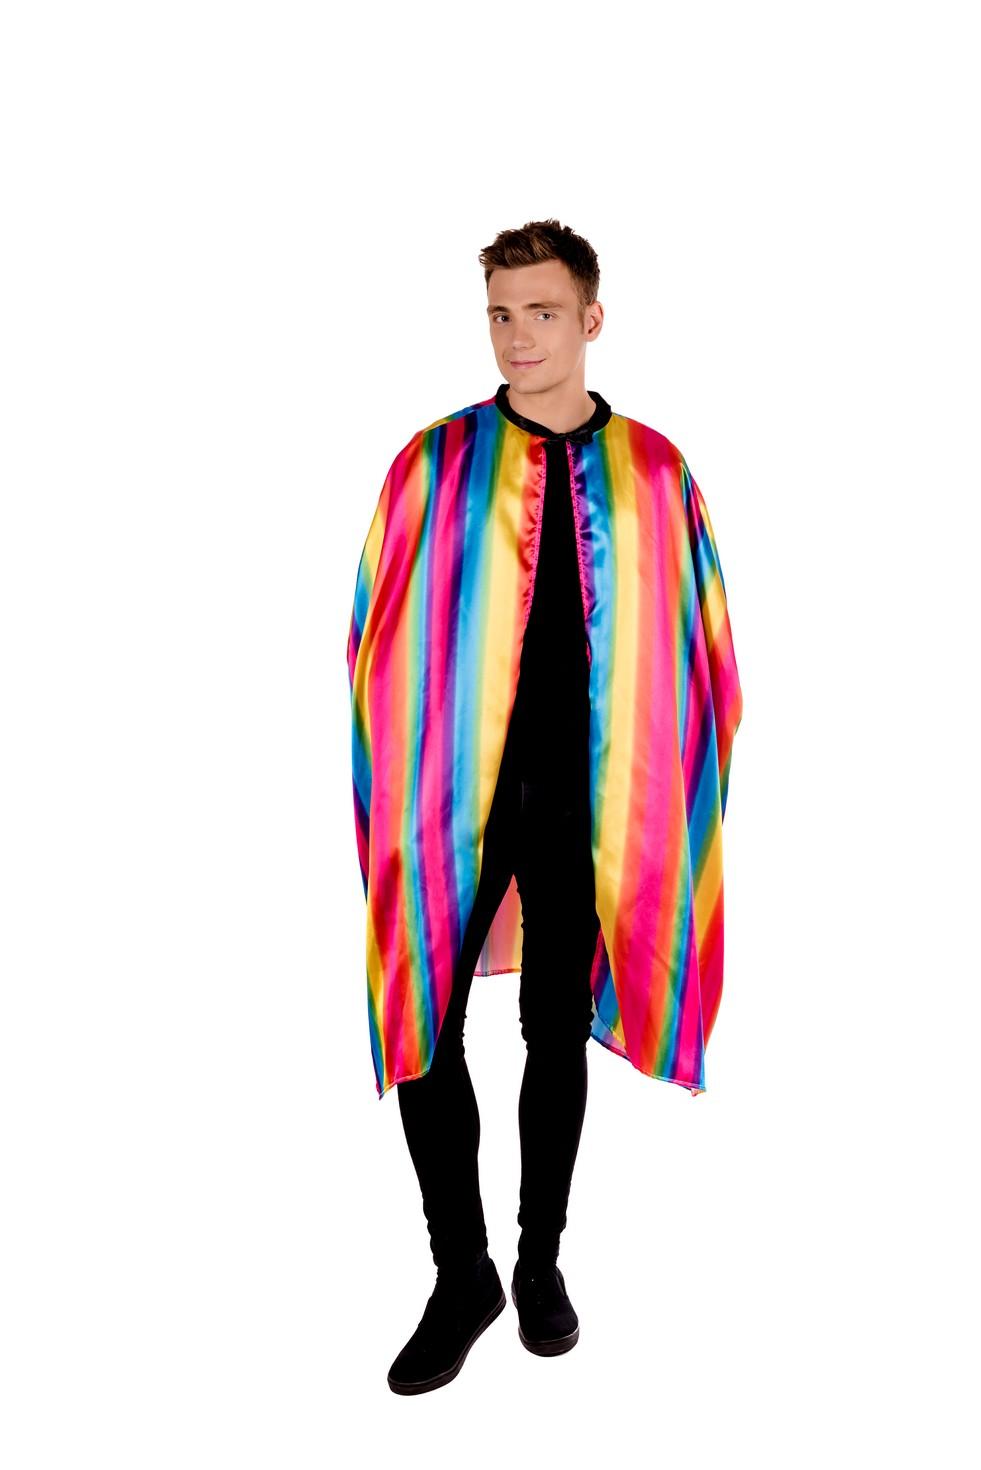 Pride Rainbow Cape Festival Parade Party Fancy Dress Accessories